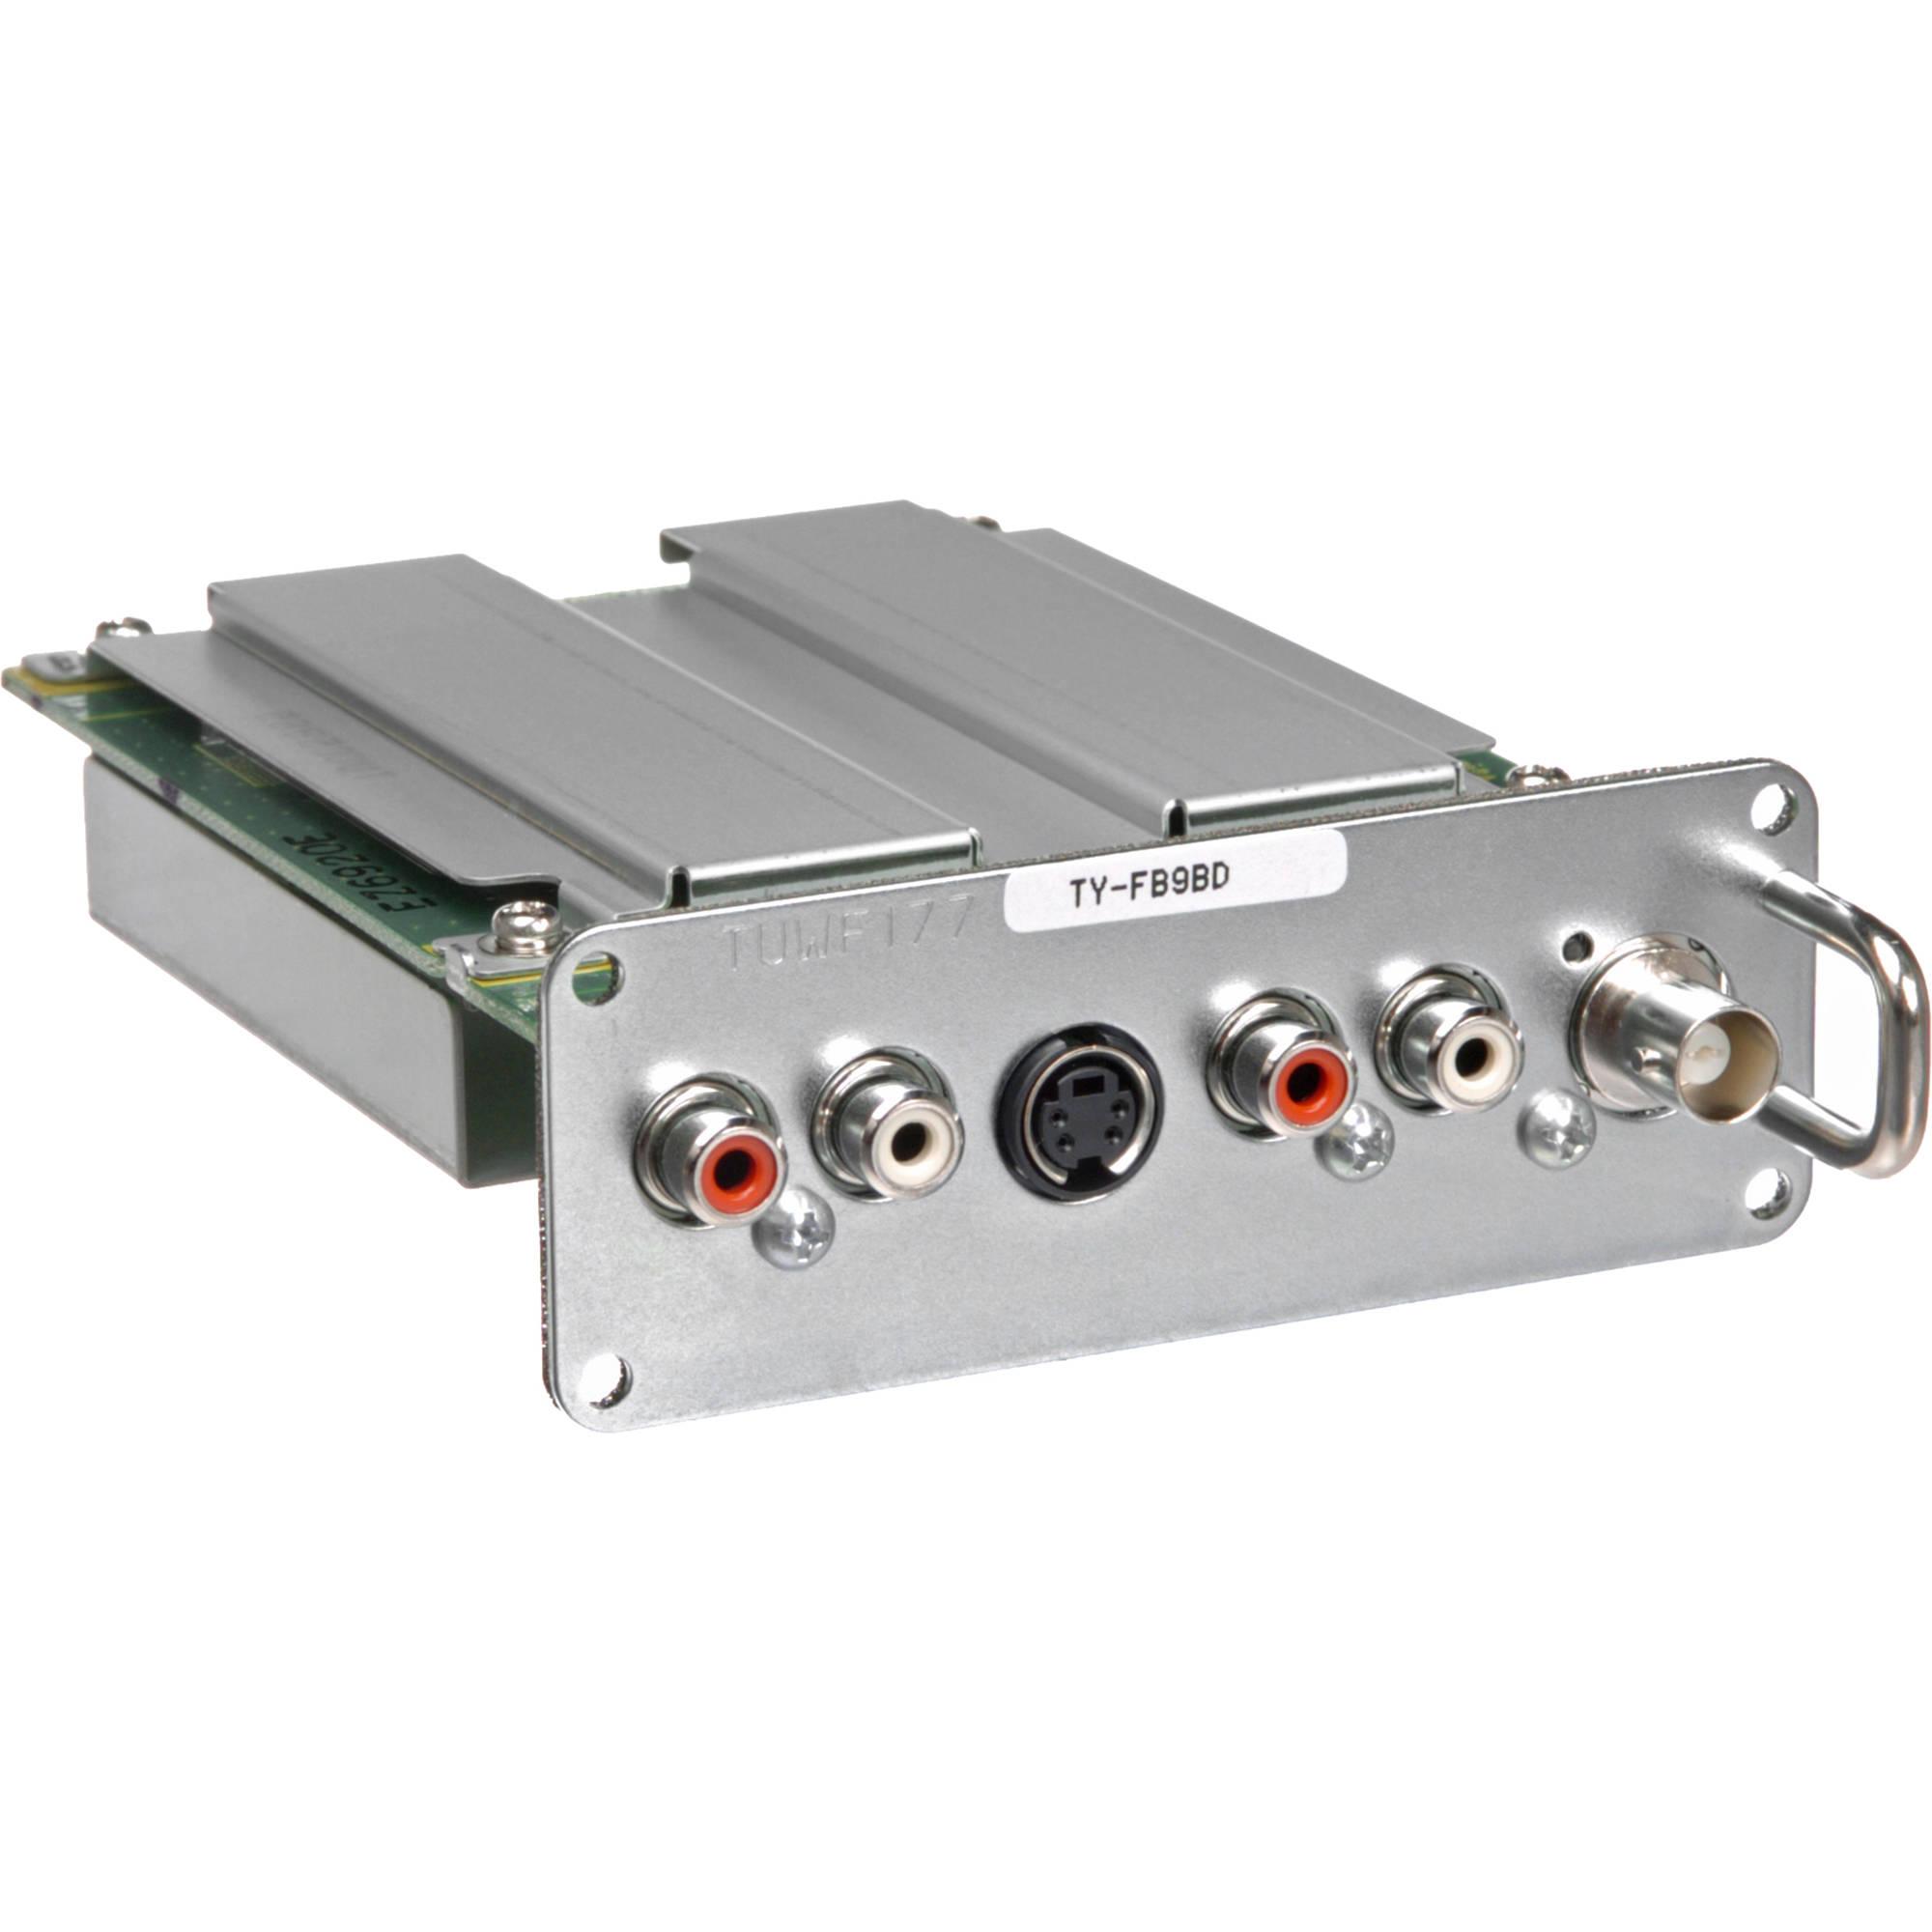 Panasonic TY-FB9BD Dual Video Terminal Board for 9 Series Professional  Plasma Displays